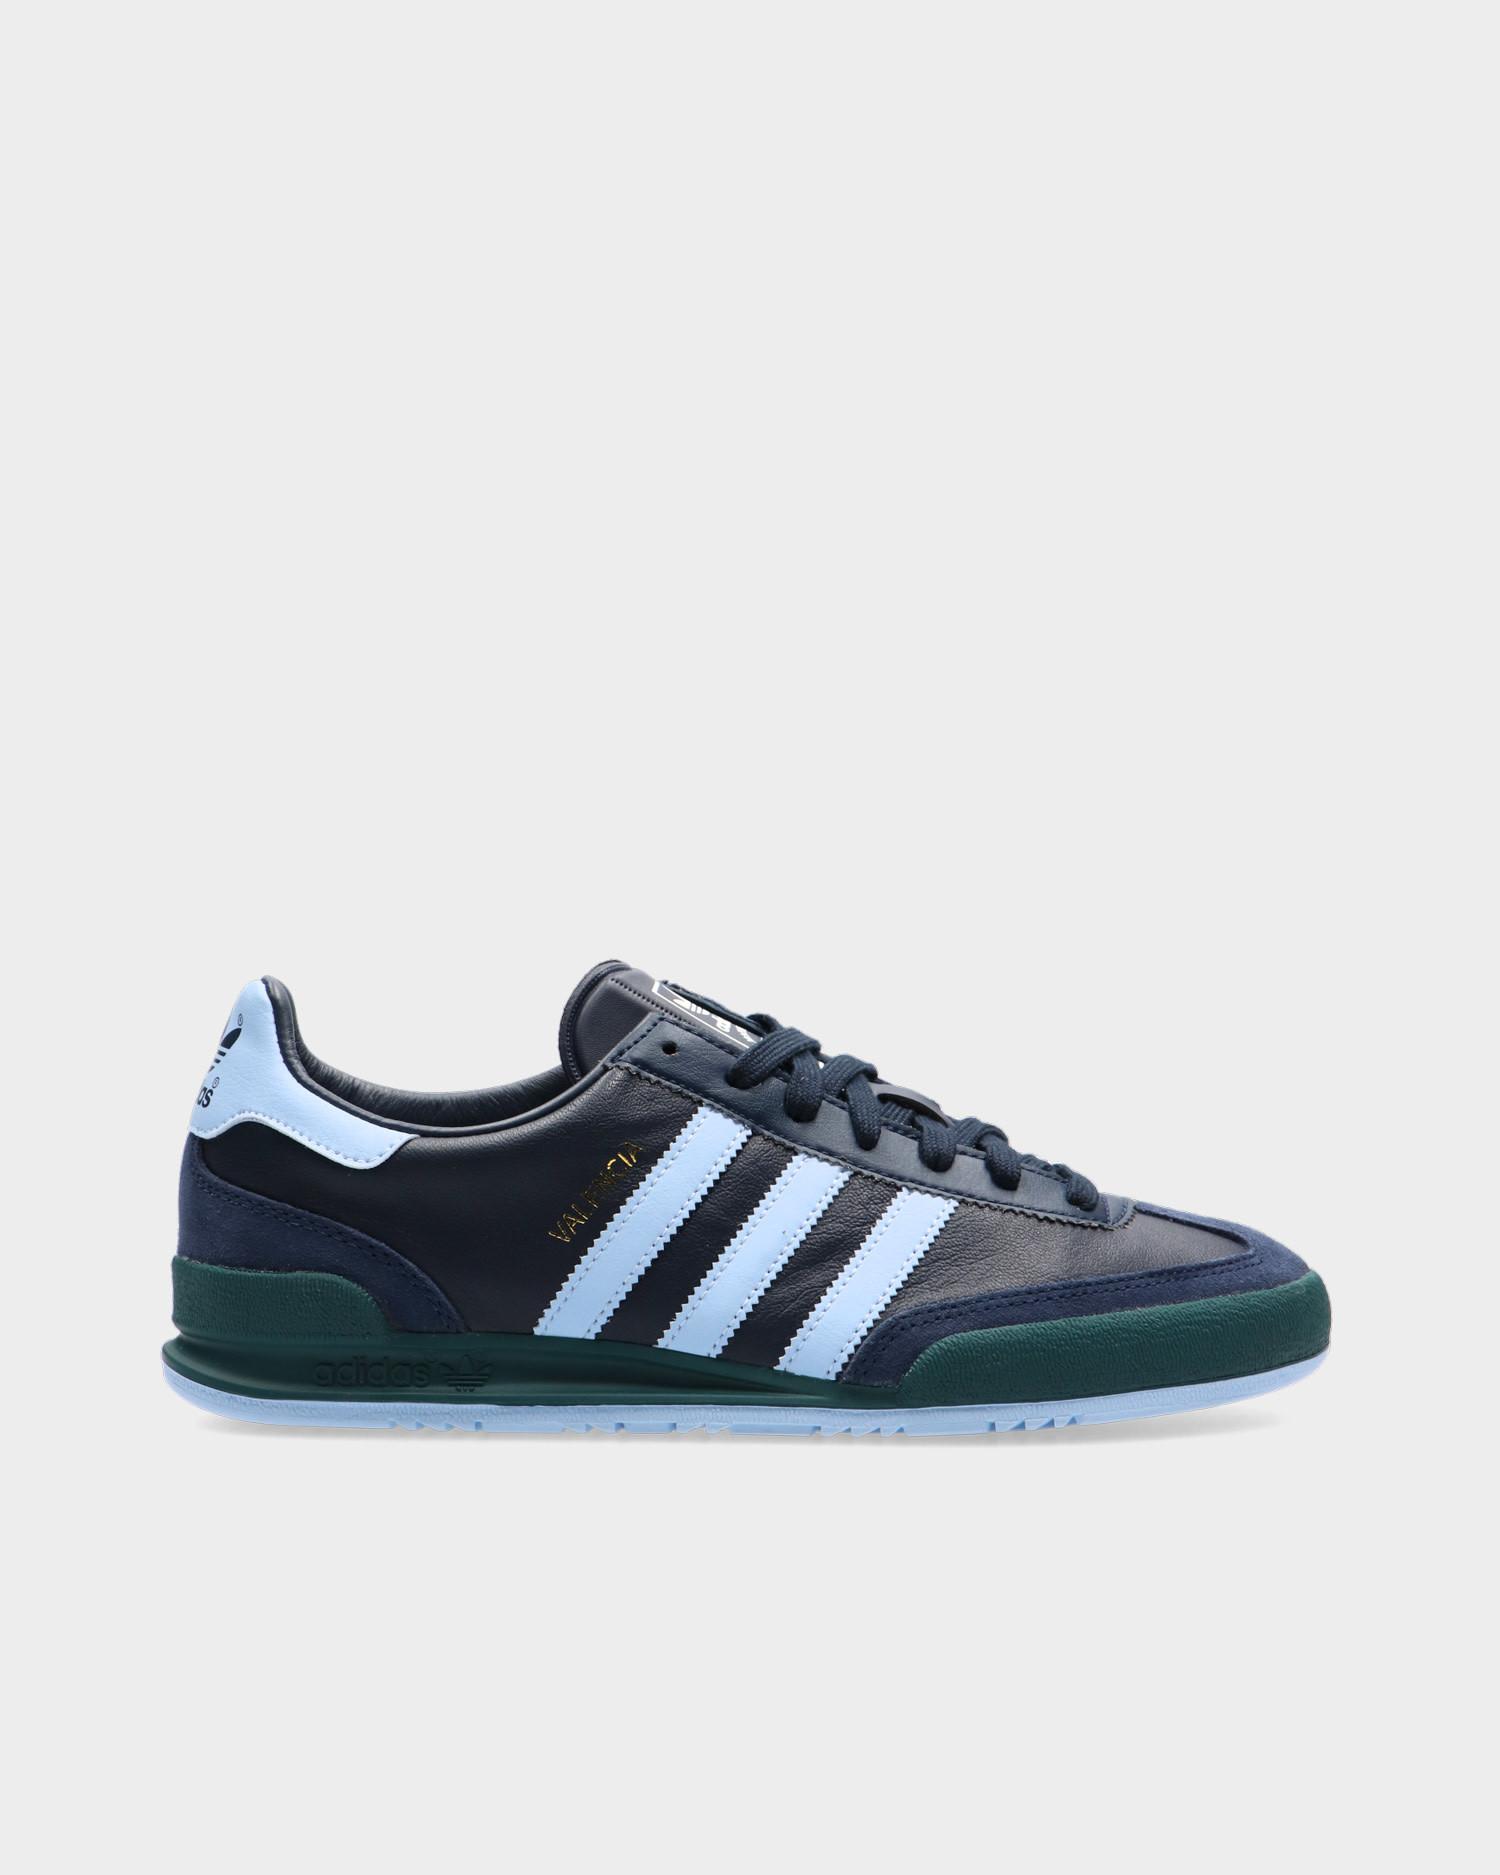 Adidas Valencia CoNavy/HalBlu/MysGrn